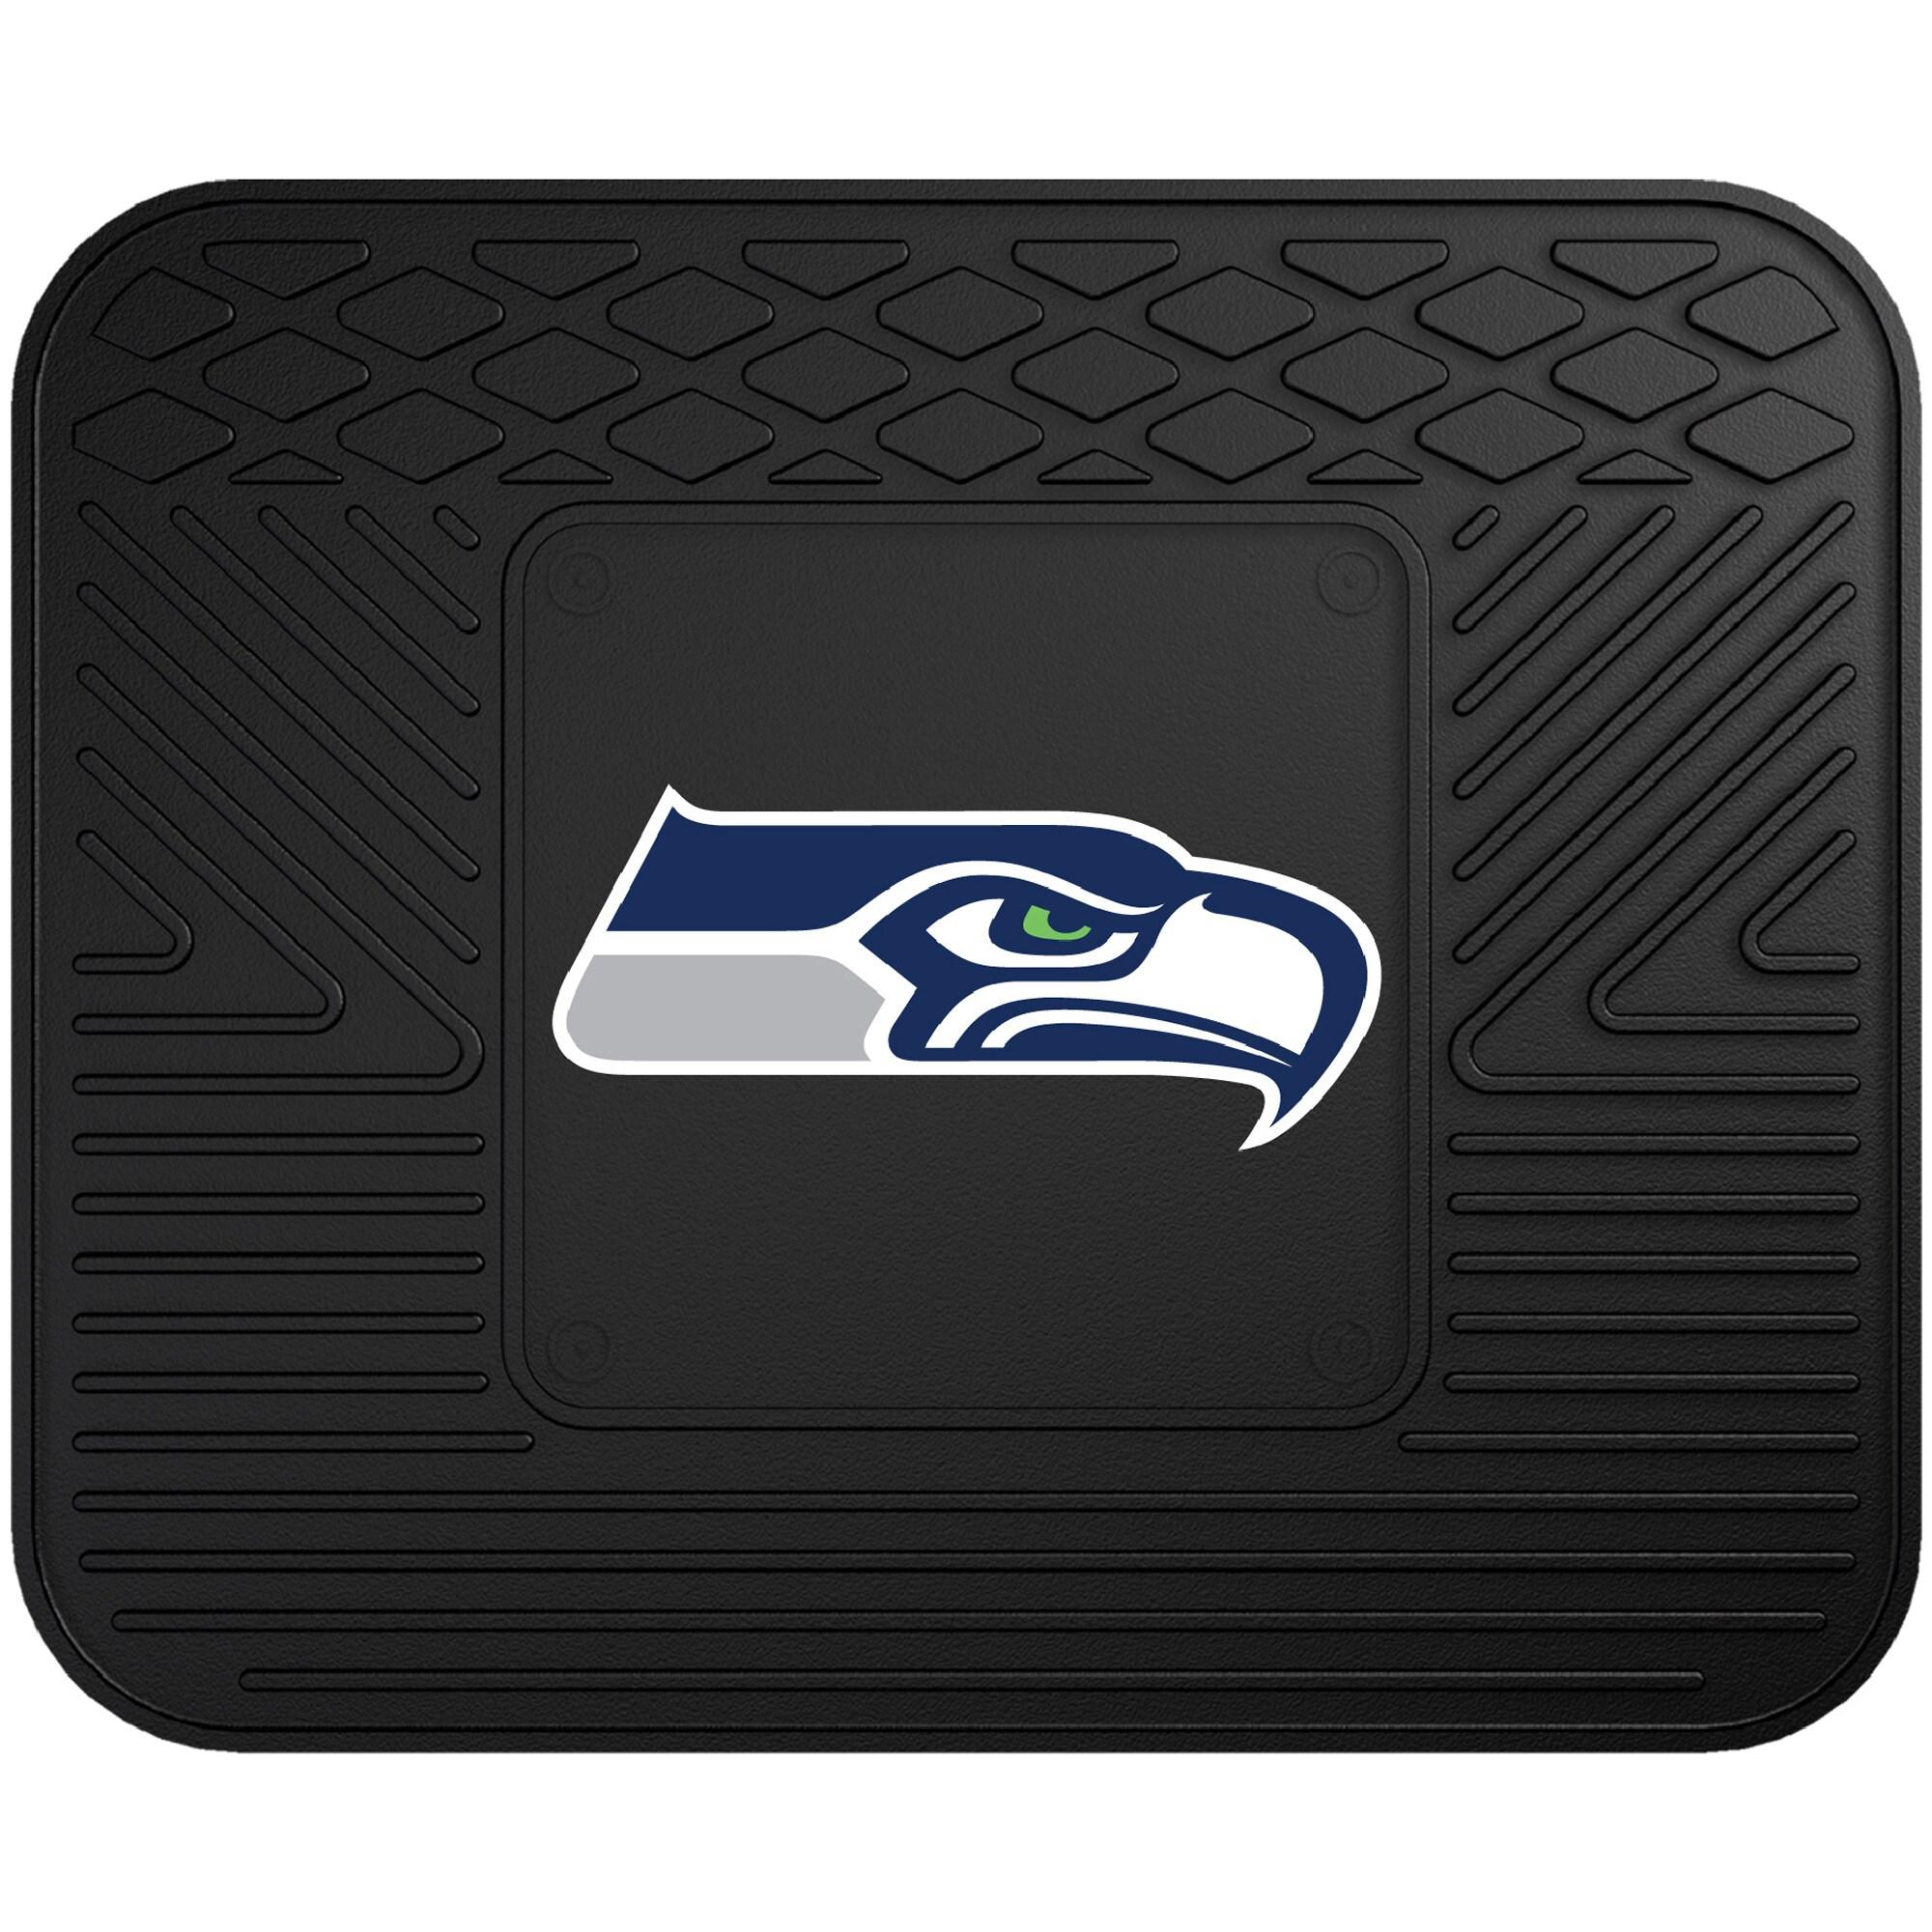 "Seattle Seahawks 17"" x 14"" Utility Mat"